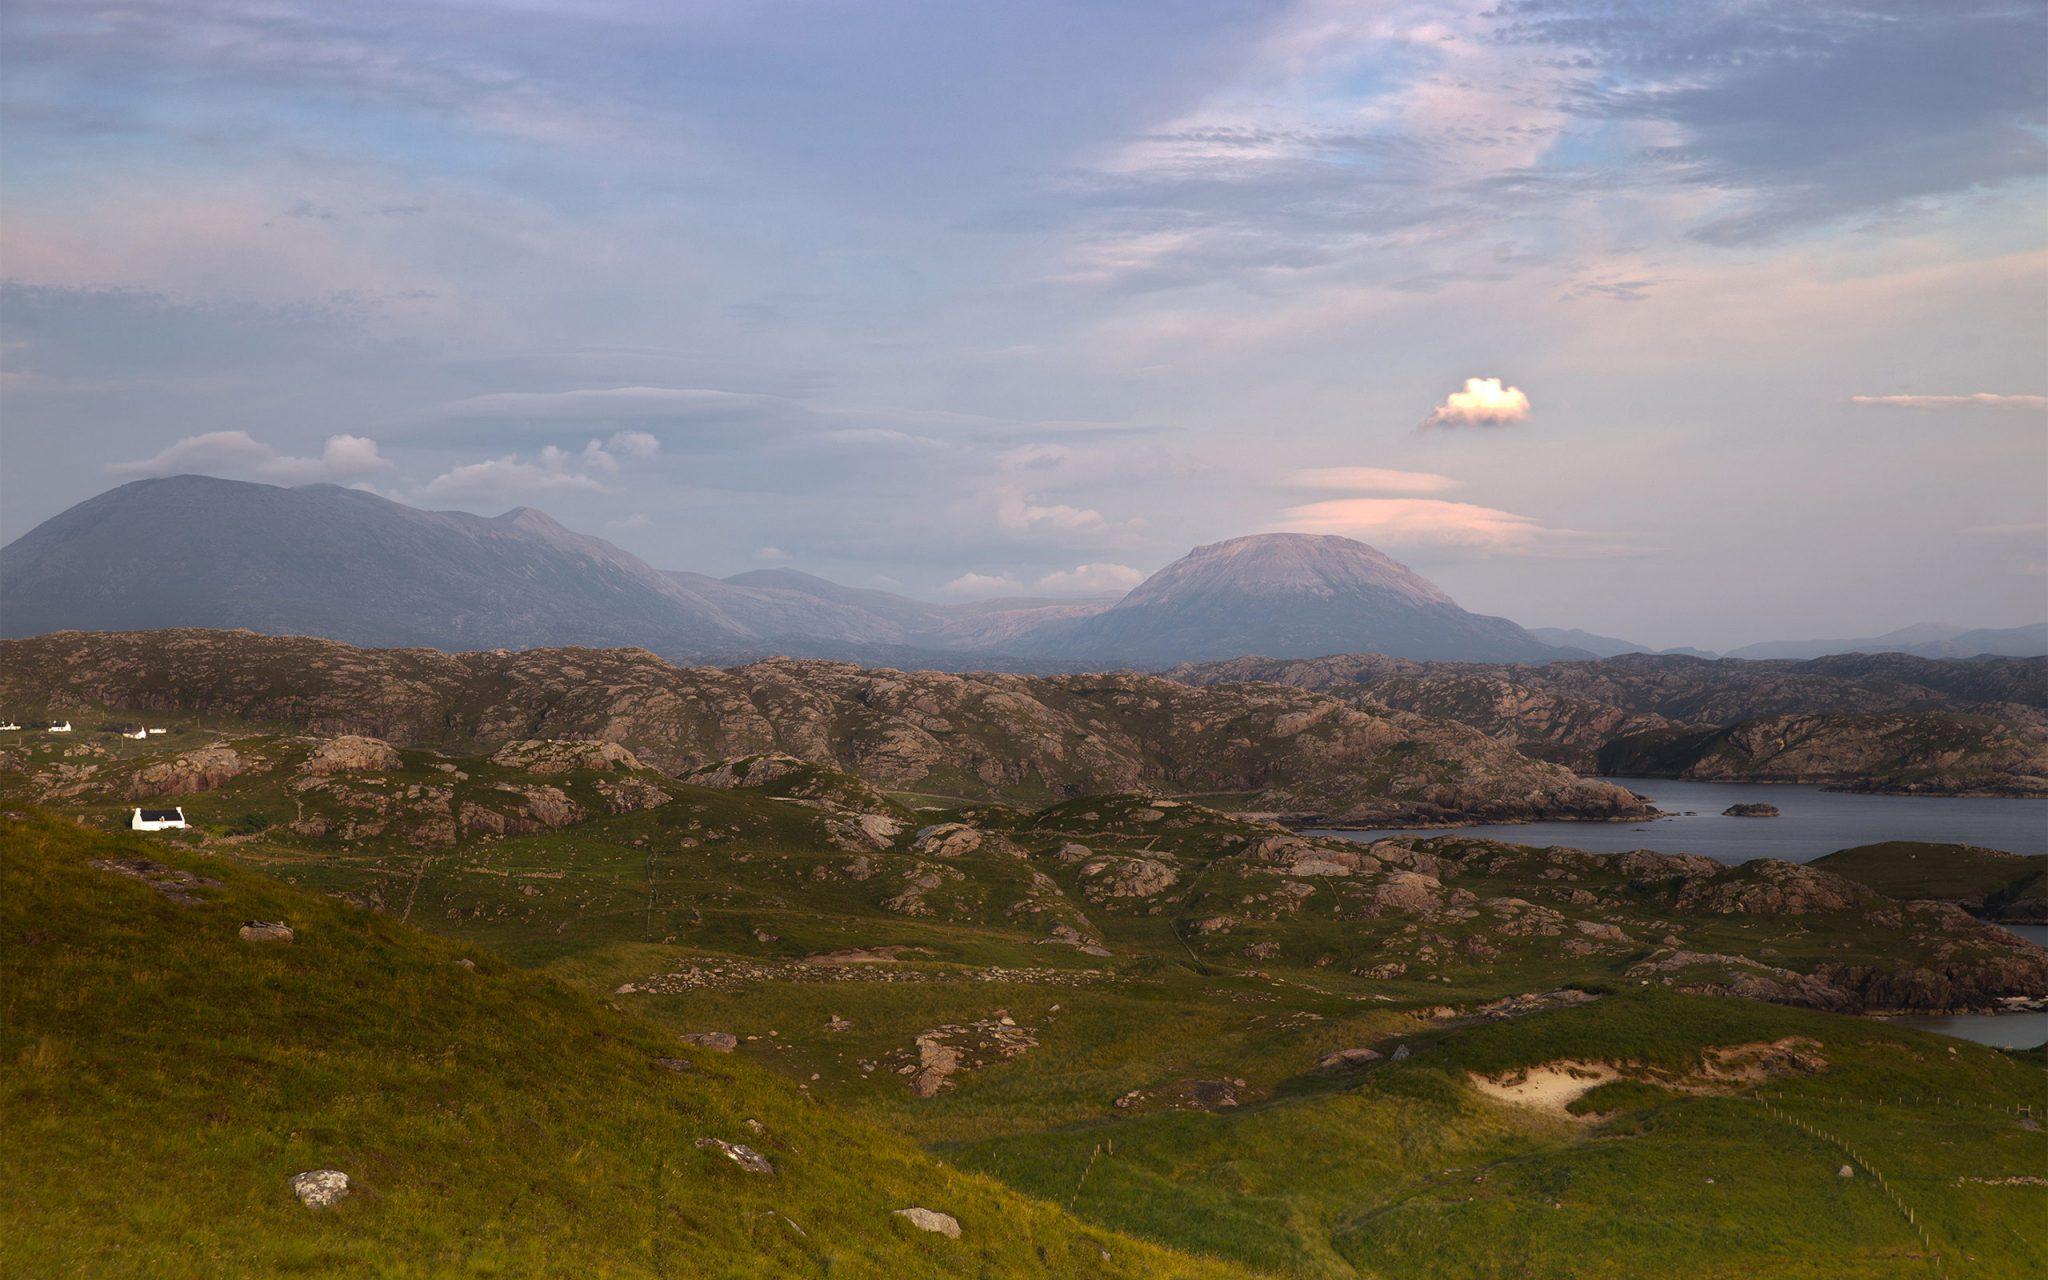 Carey Marks Photography, Documentary Photography, nature, environmental science, Mountains, Landscape, Highlands, Scottish Highlands, Lairg, Sutherland, Vista, Panorama, Landscape photography, Shegra, Balchrick